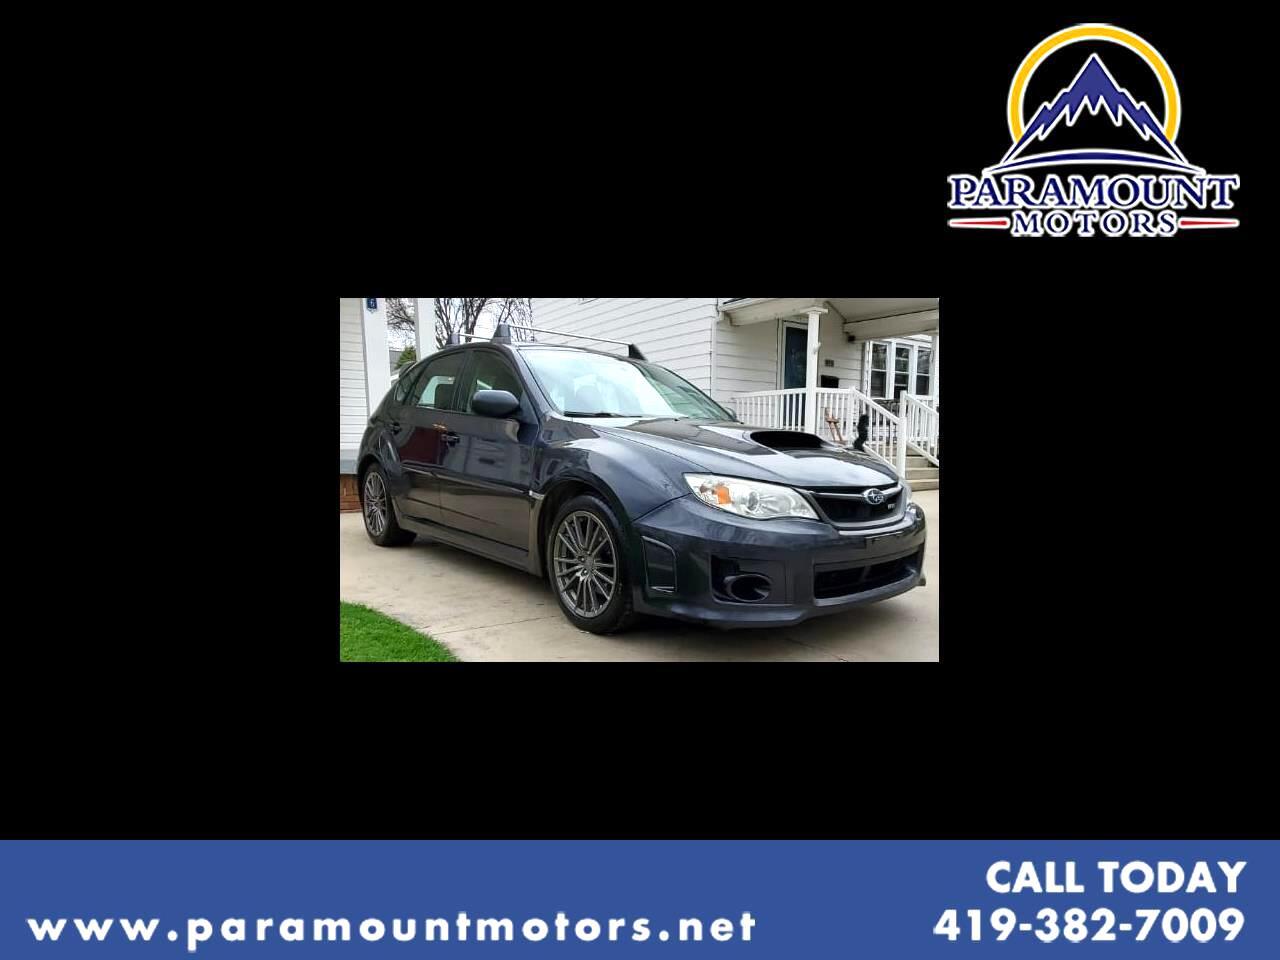 Subaru Impreza Wagon WRX 5dr Man WRX 2014